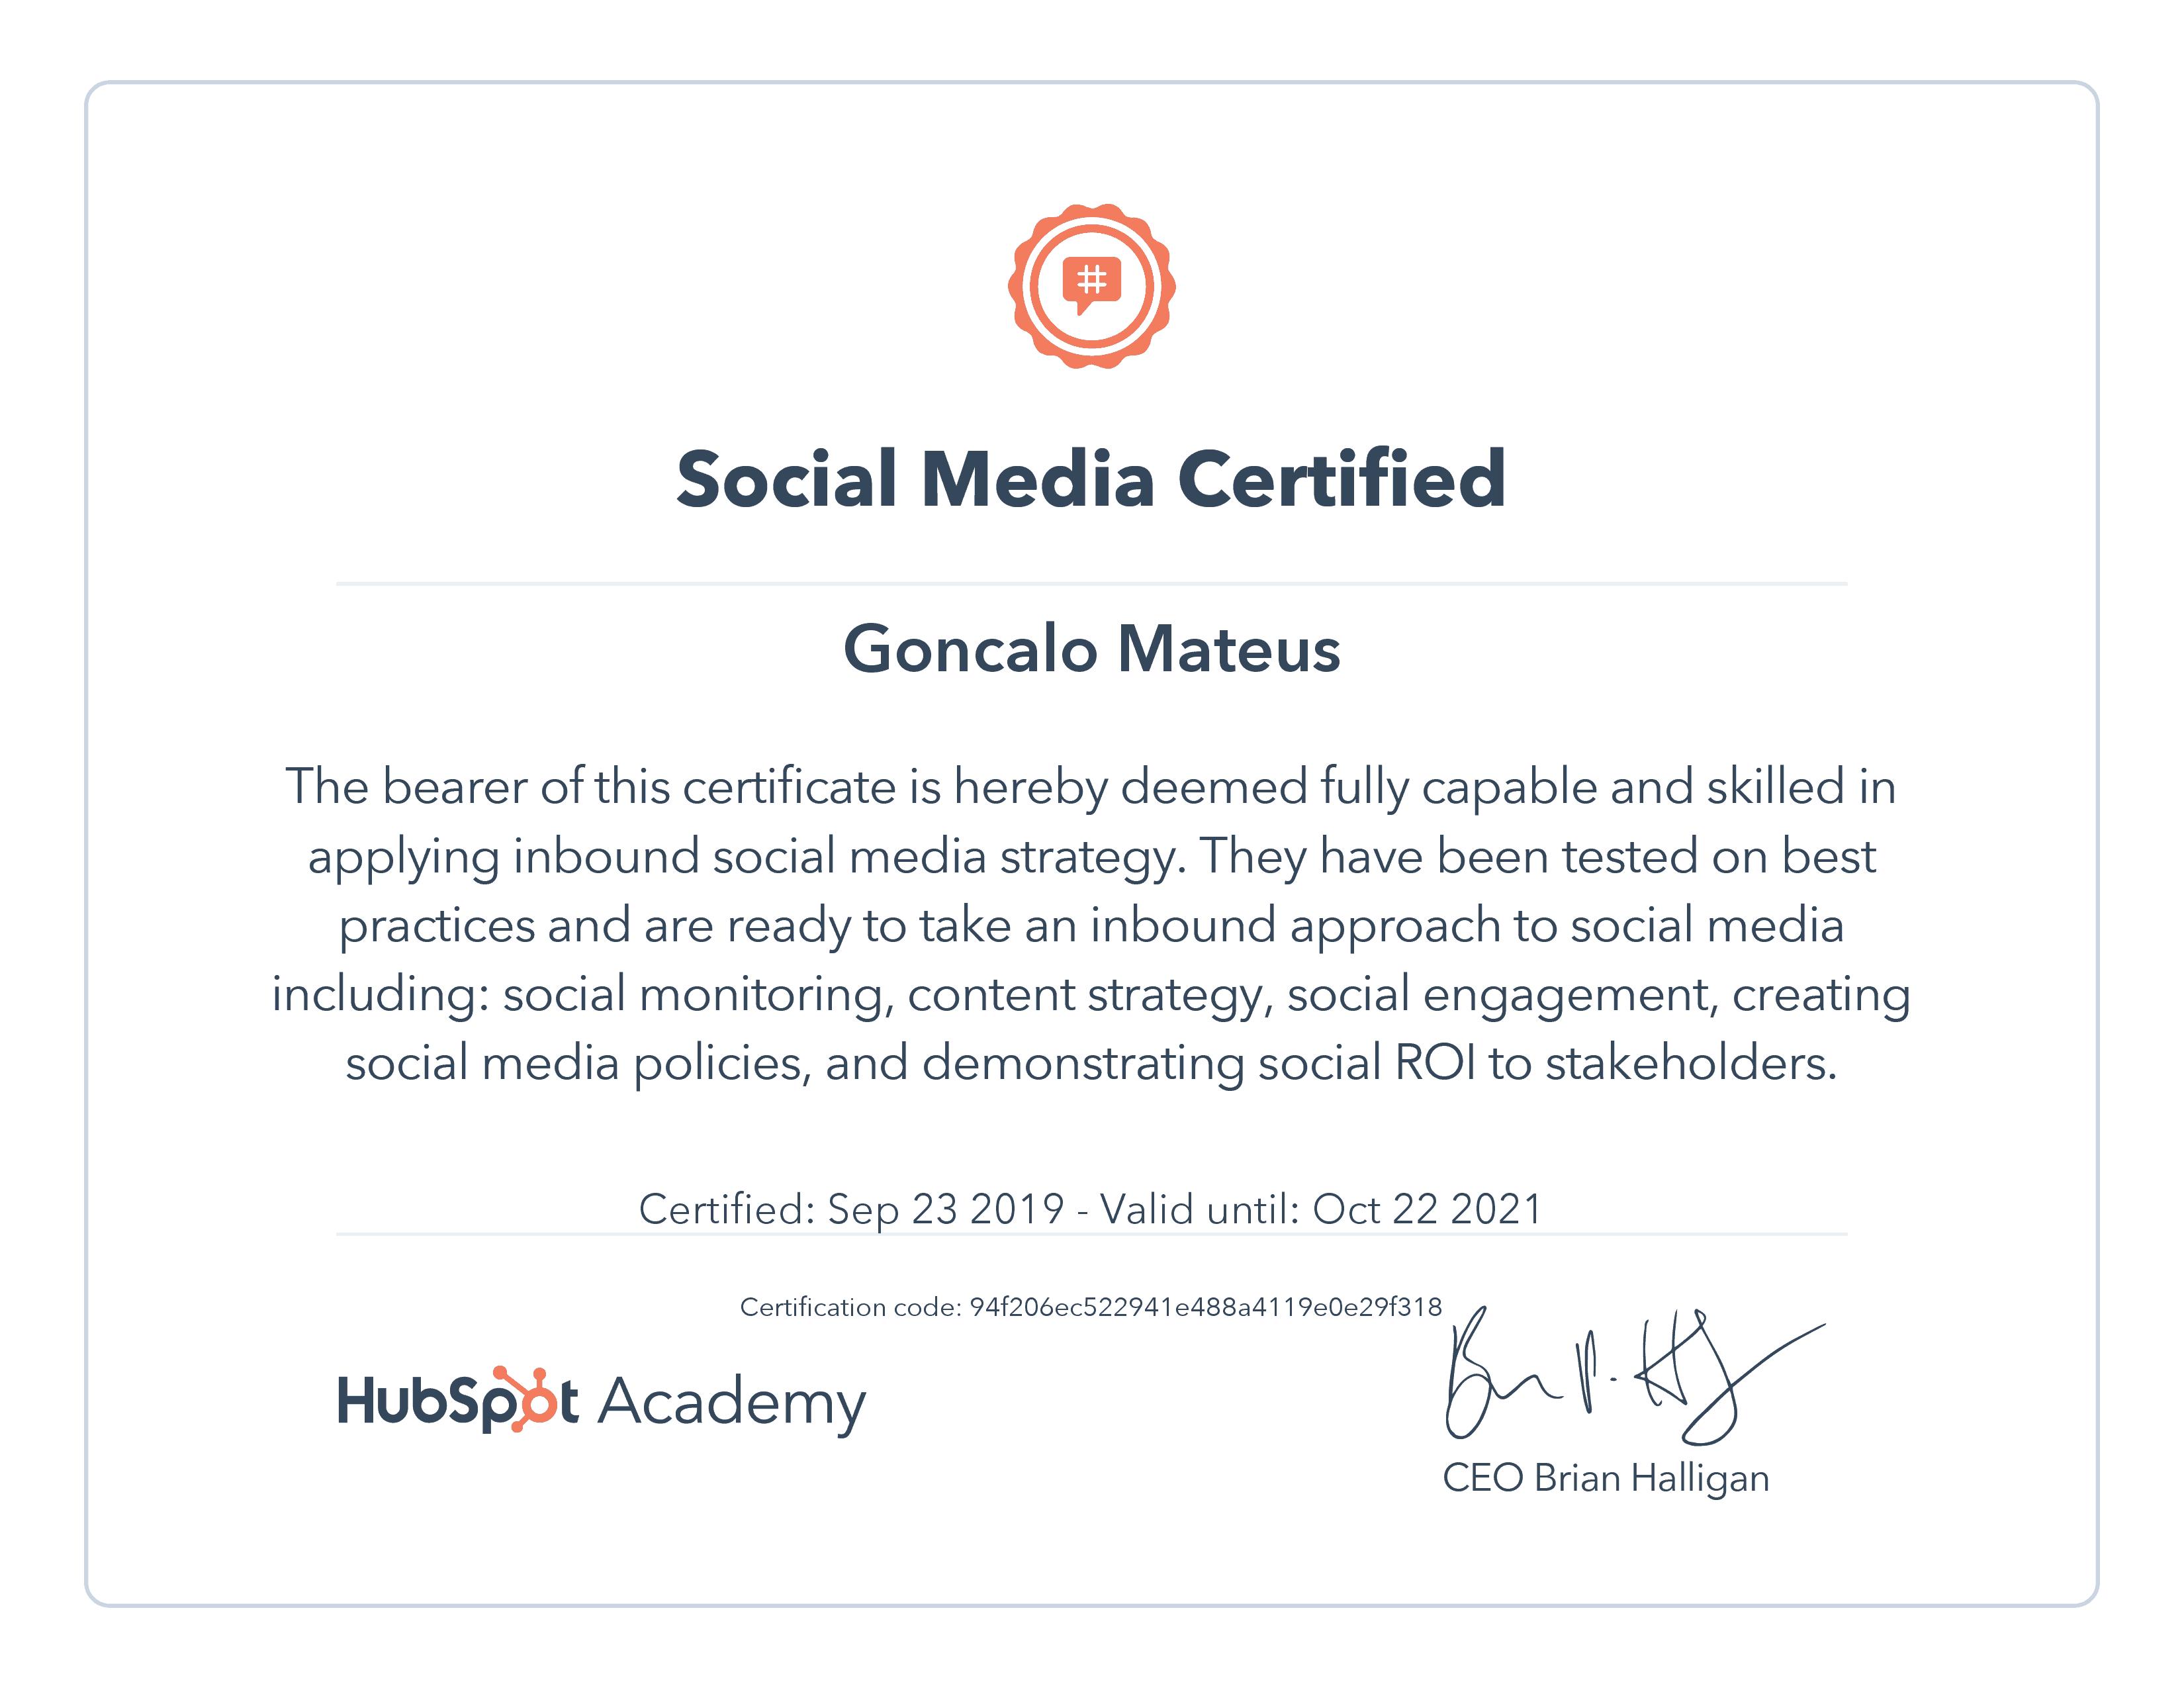 Image of Hubspot Academy Social Media Certificate